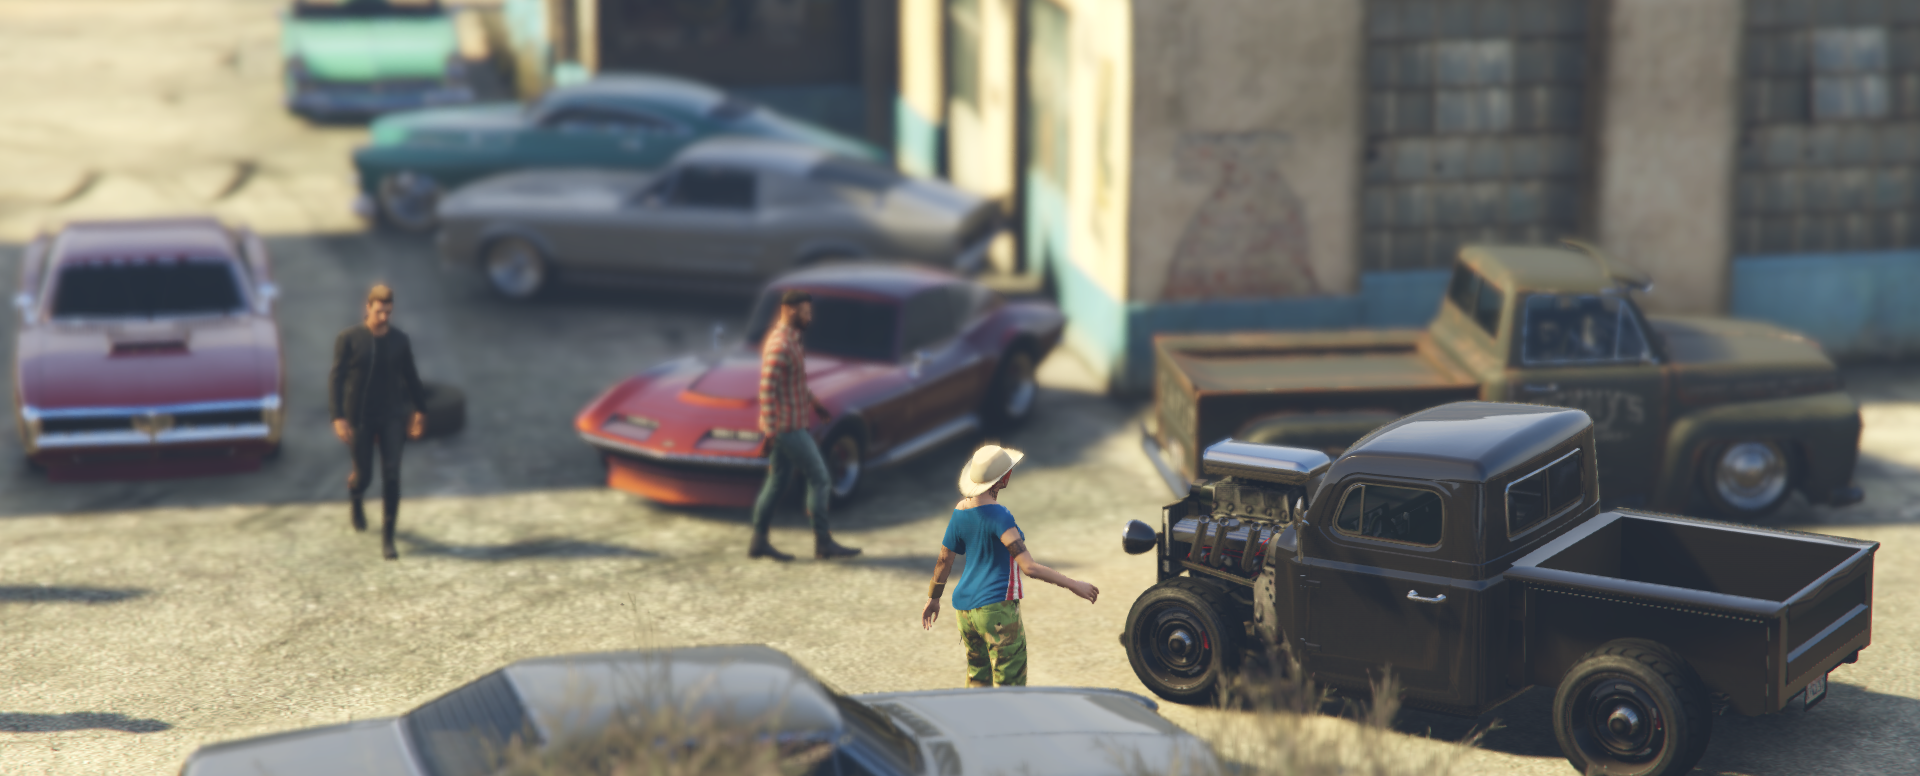 Grand_Theft_Auto_V_04_04_2018_15_38_54_2